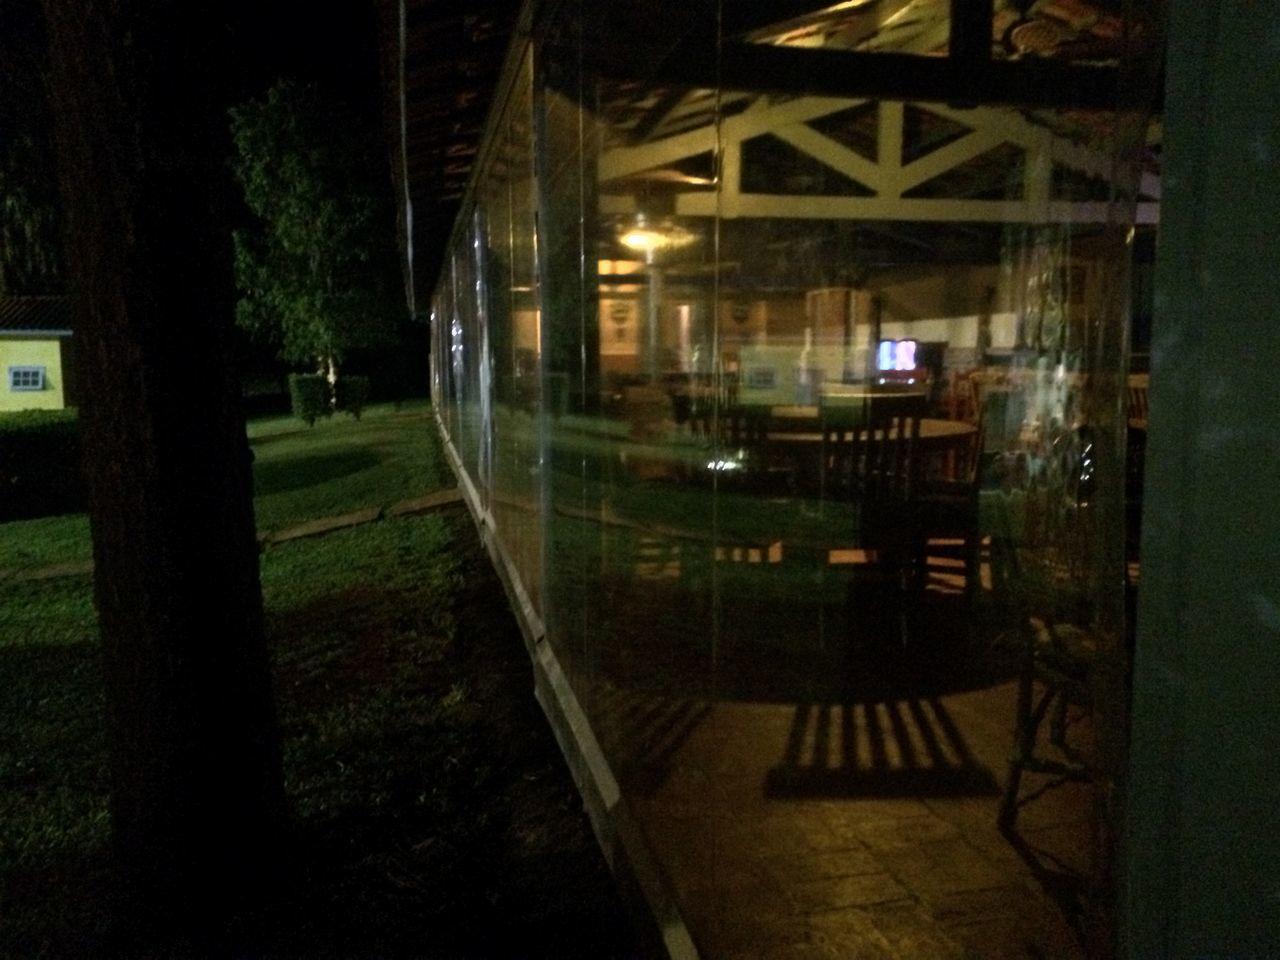 night, illuminated, no people, outdoors, architecture